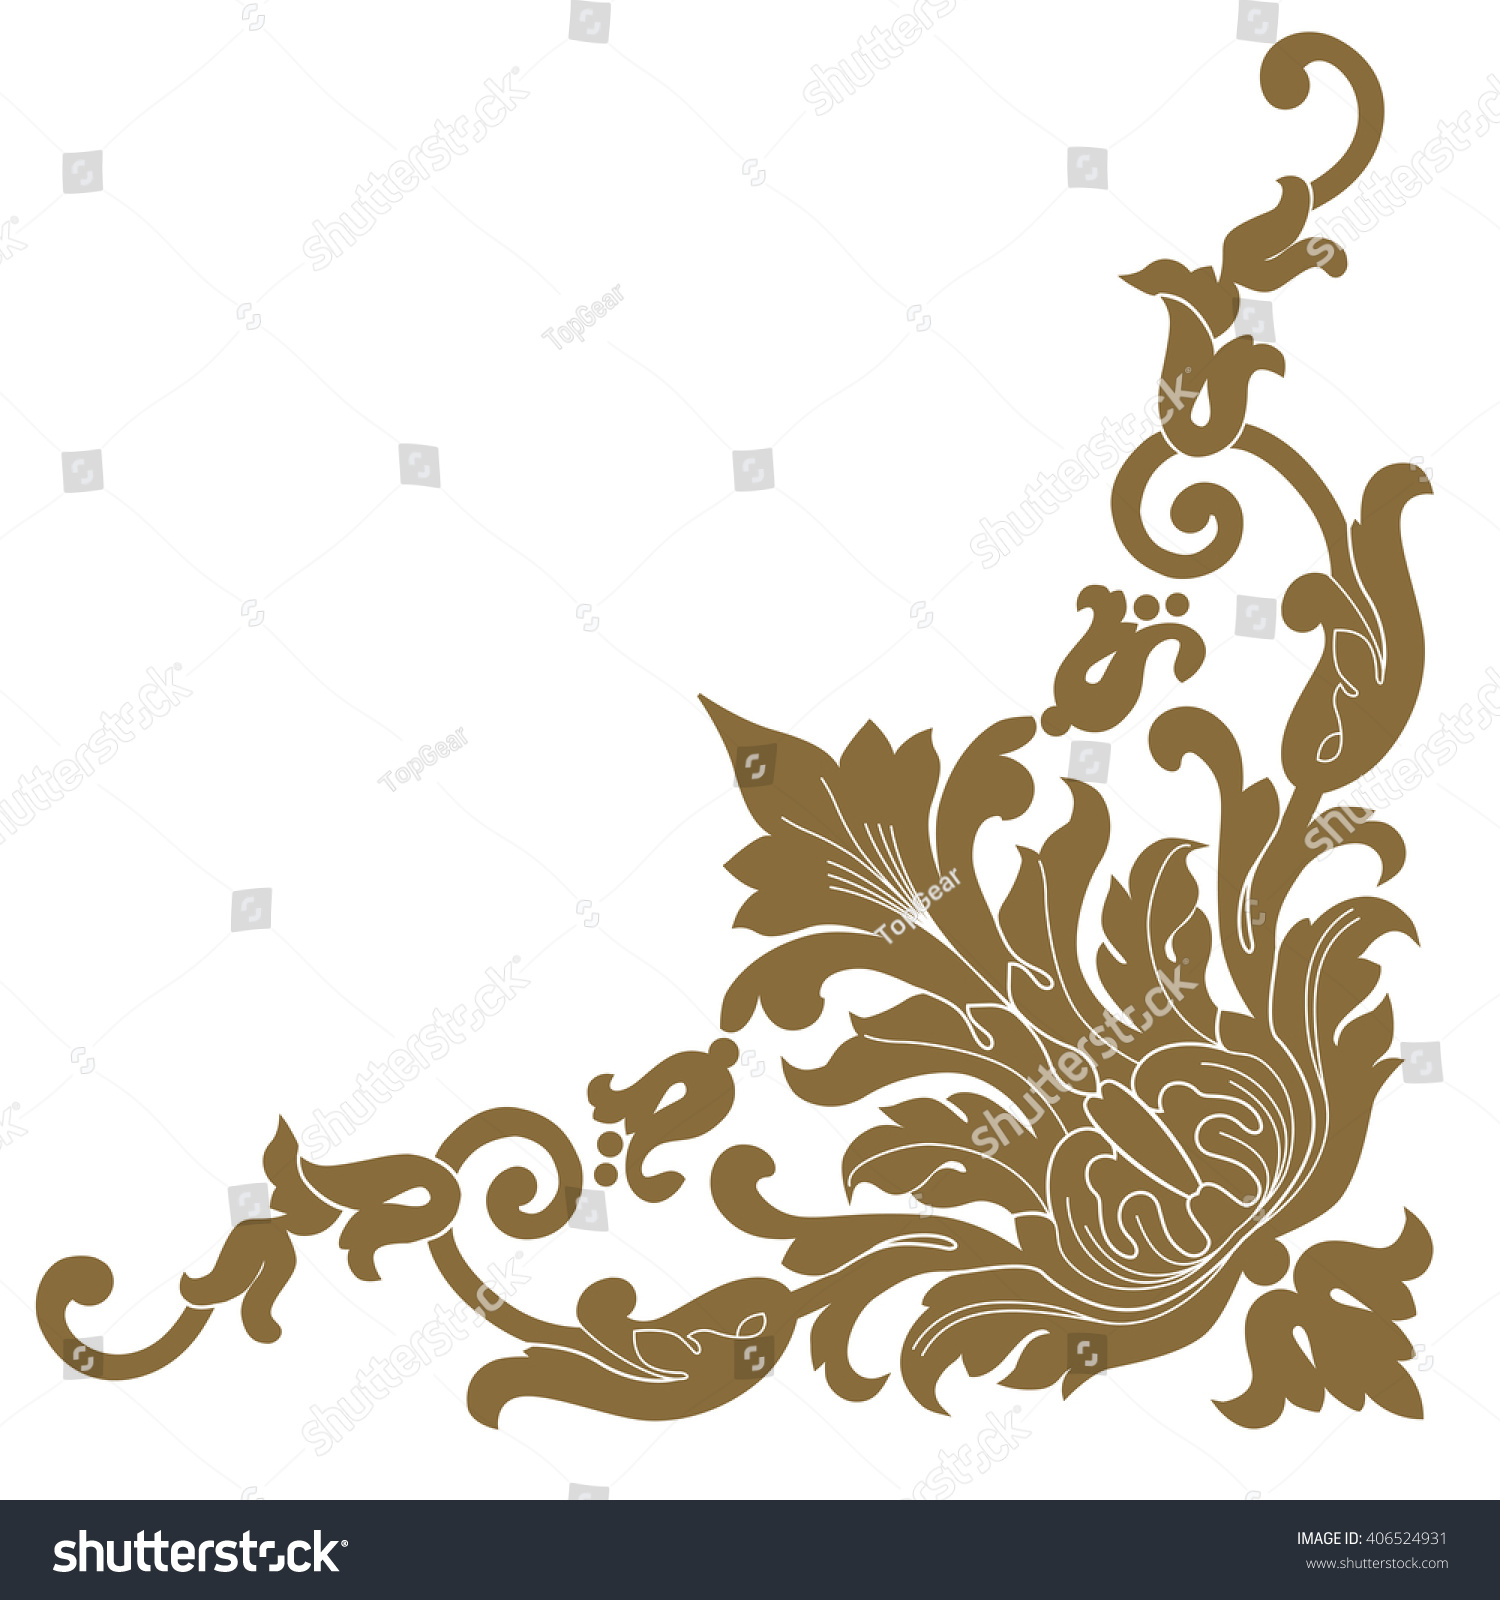 Premium Gold Vintage Baroque Frame Scroll Corner Ornament Engraving Border Floral Retro Pattern Antique Style Acanthus Foliage Swirl Decorative Design